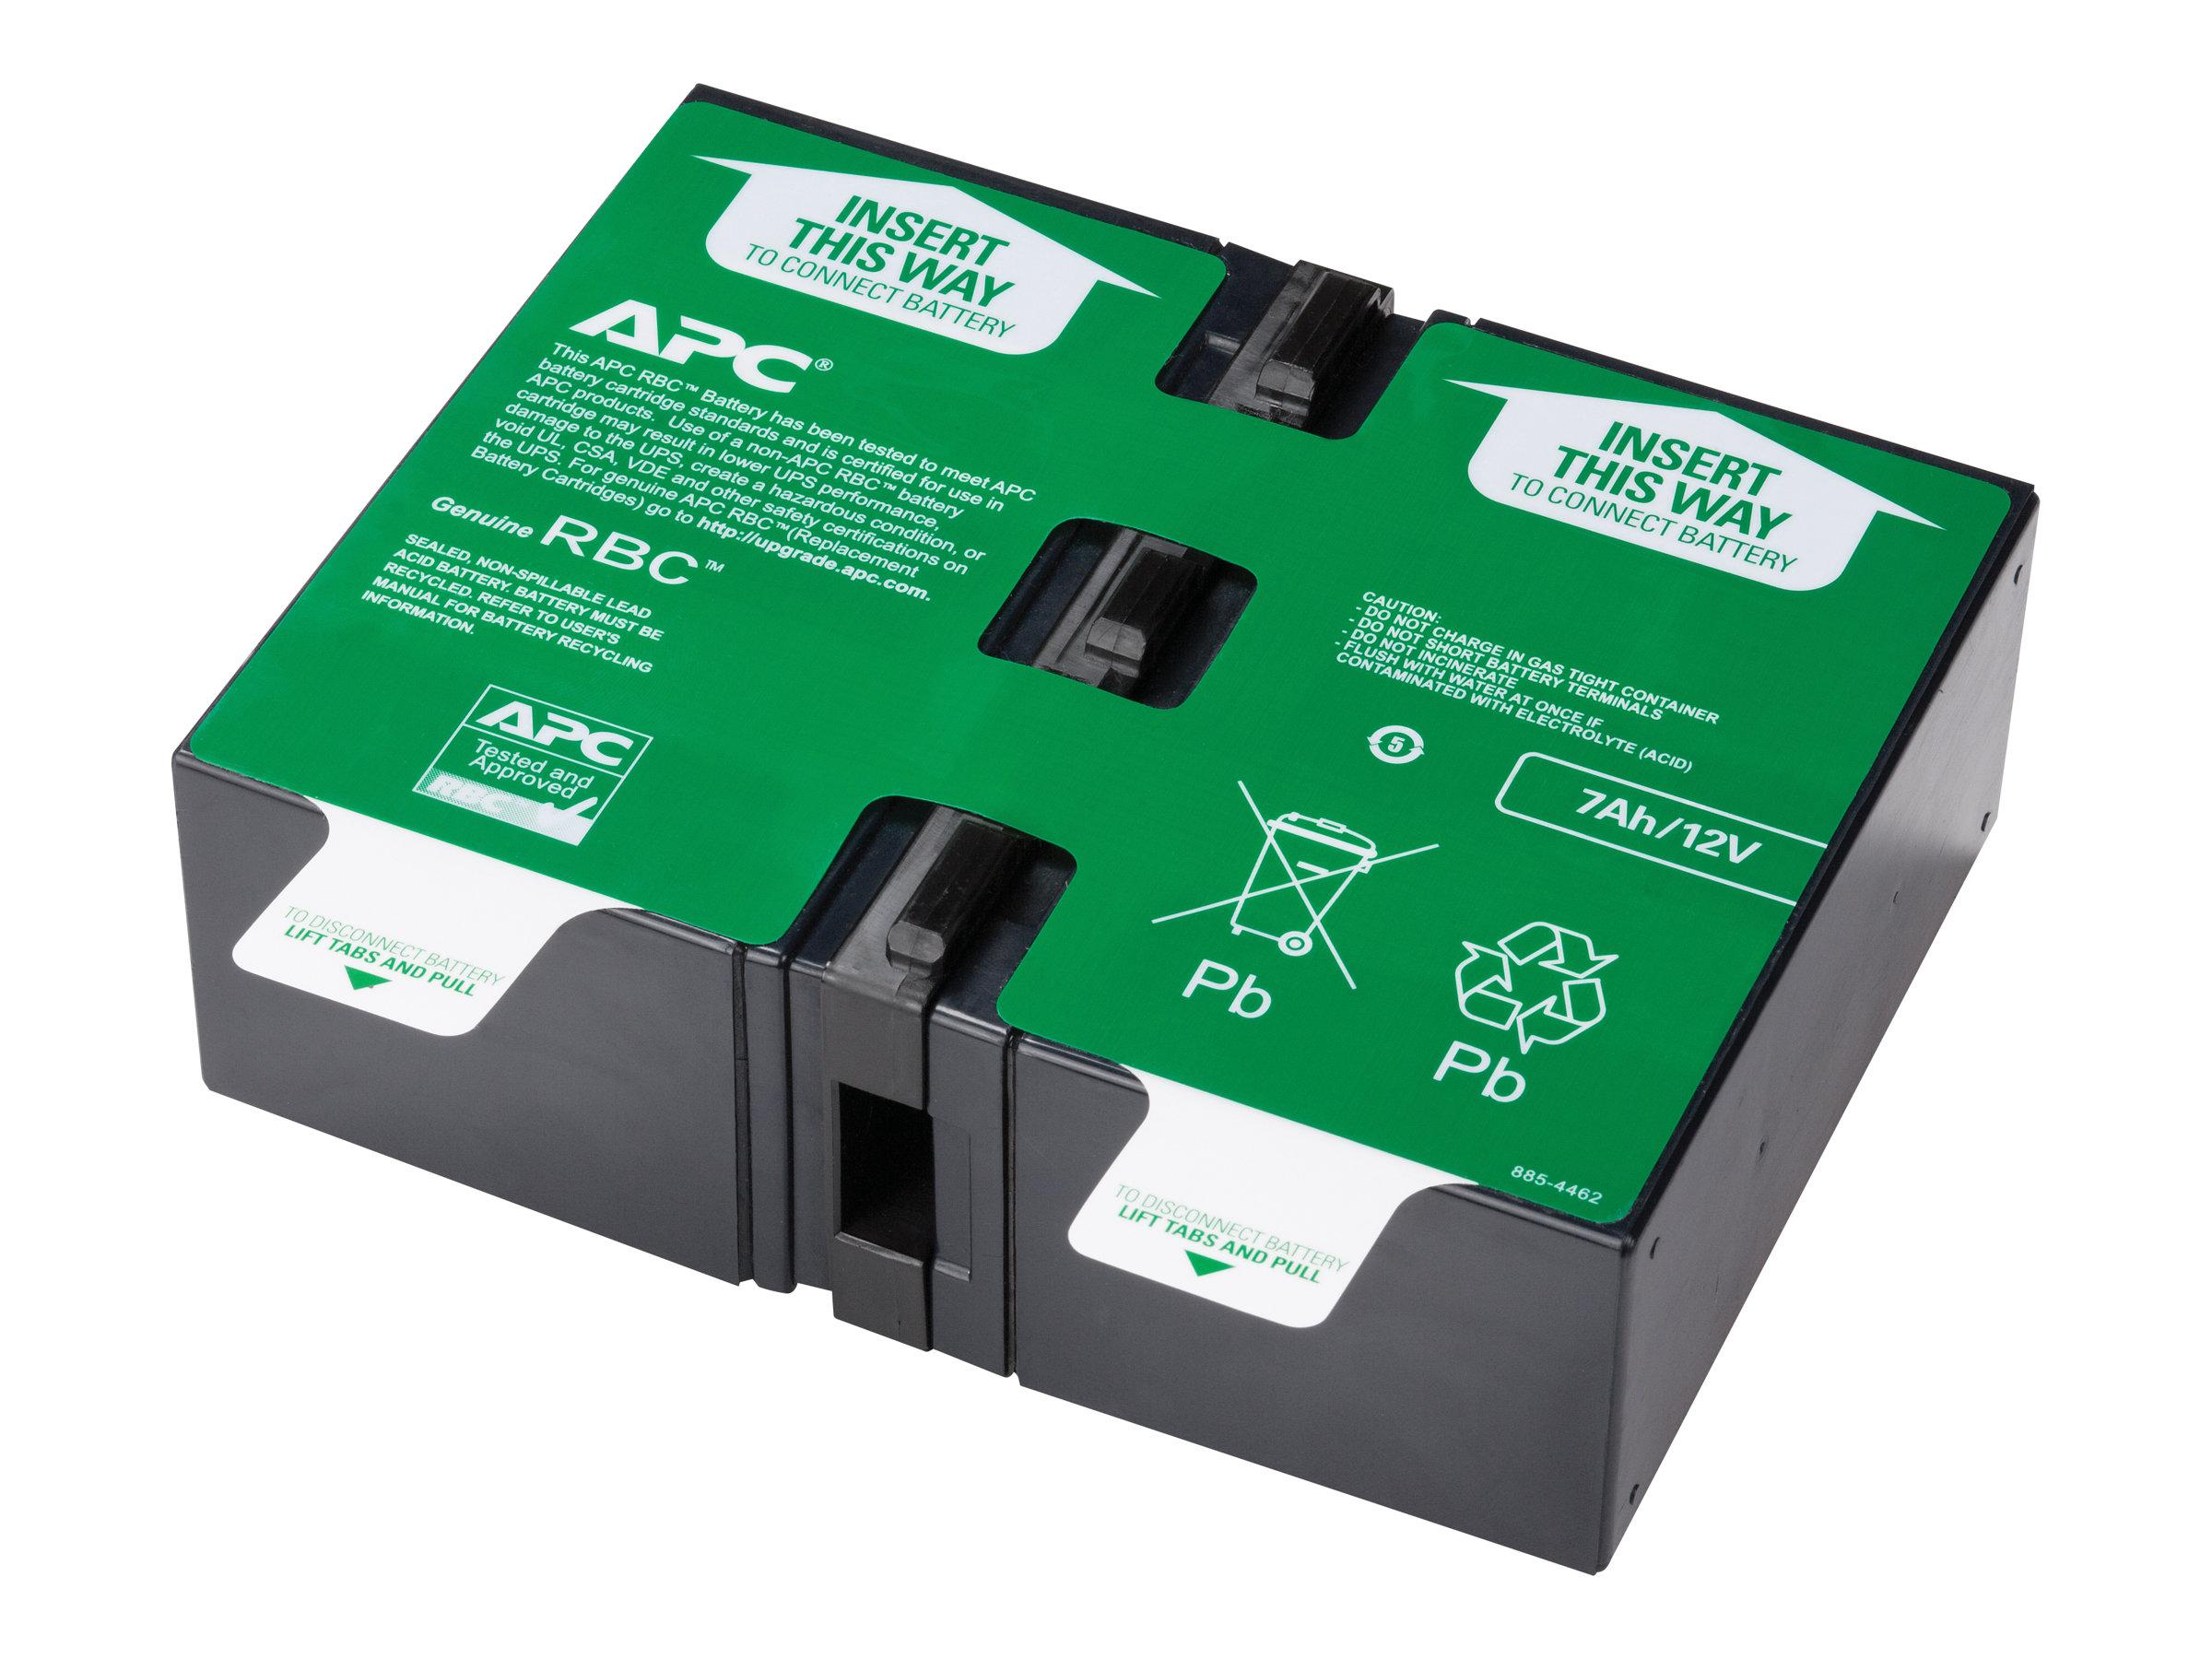 Replacement battery cartridge 123 usv akku 1 x bleisaeure fuer p n bn1350g bx1000g ca bx1350m smt750rm2uc smt750rm2unc smt750rmi2uc smt750rmi2unc 1886212 apcrbc123